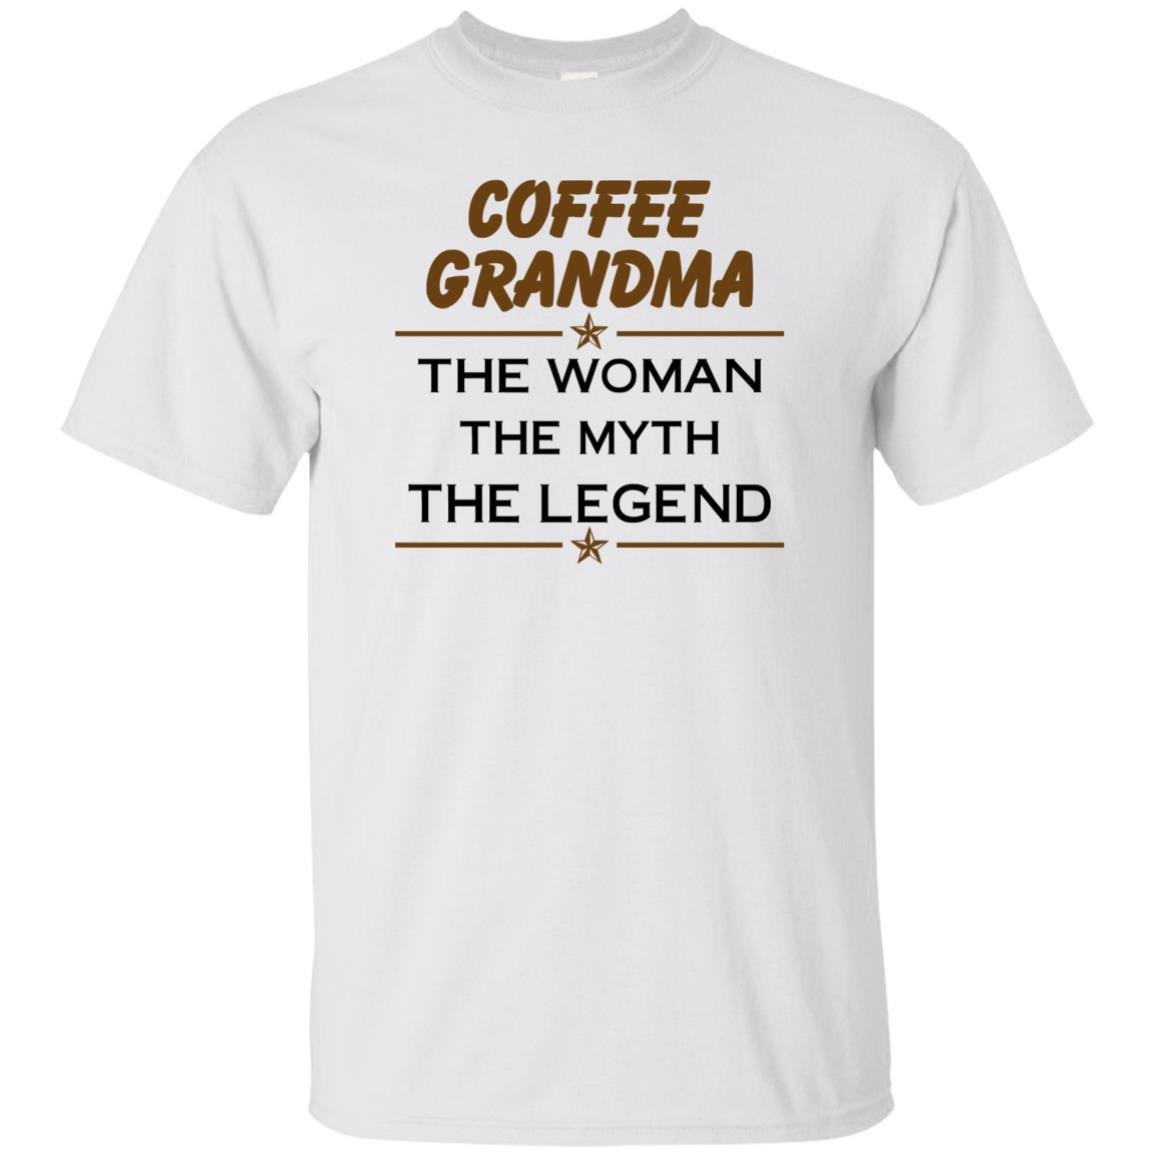 image 810px Coffee Grandma The Woman The Myth The Legend Shirt